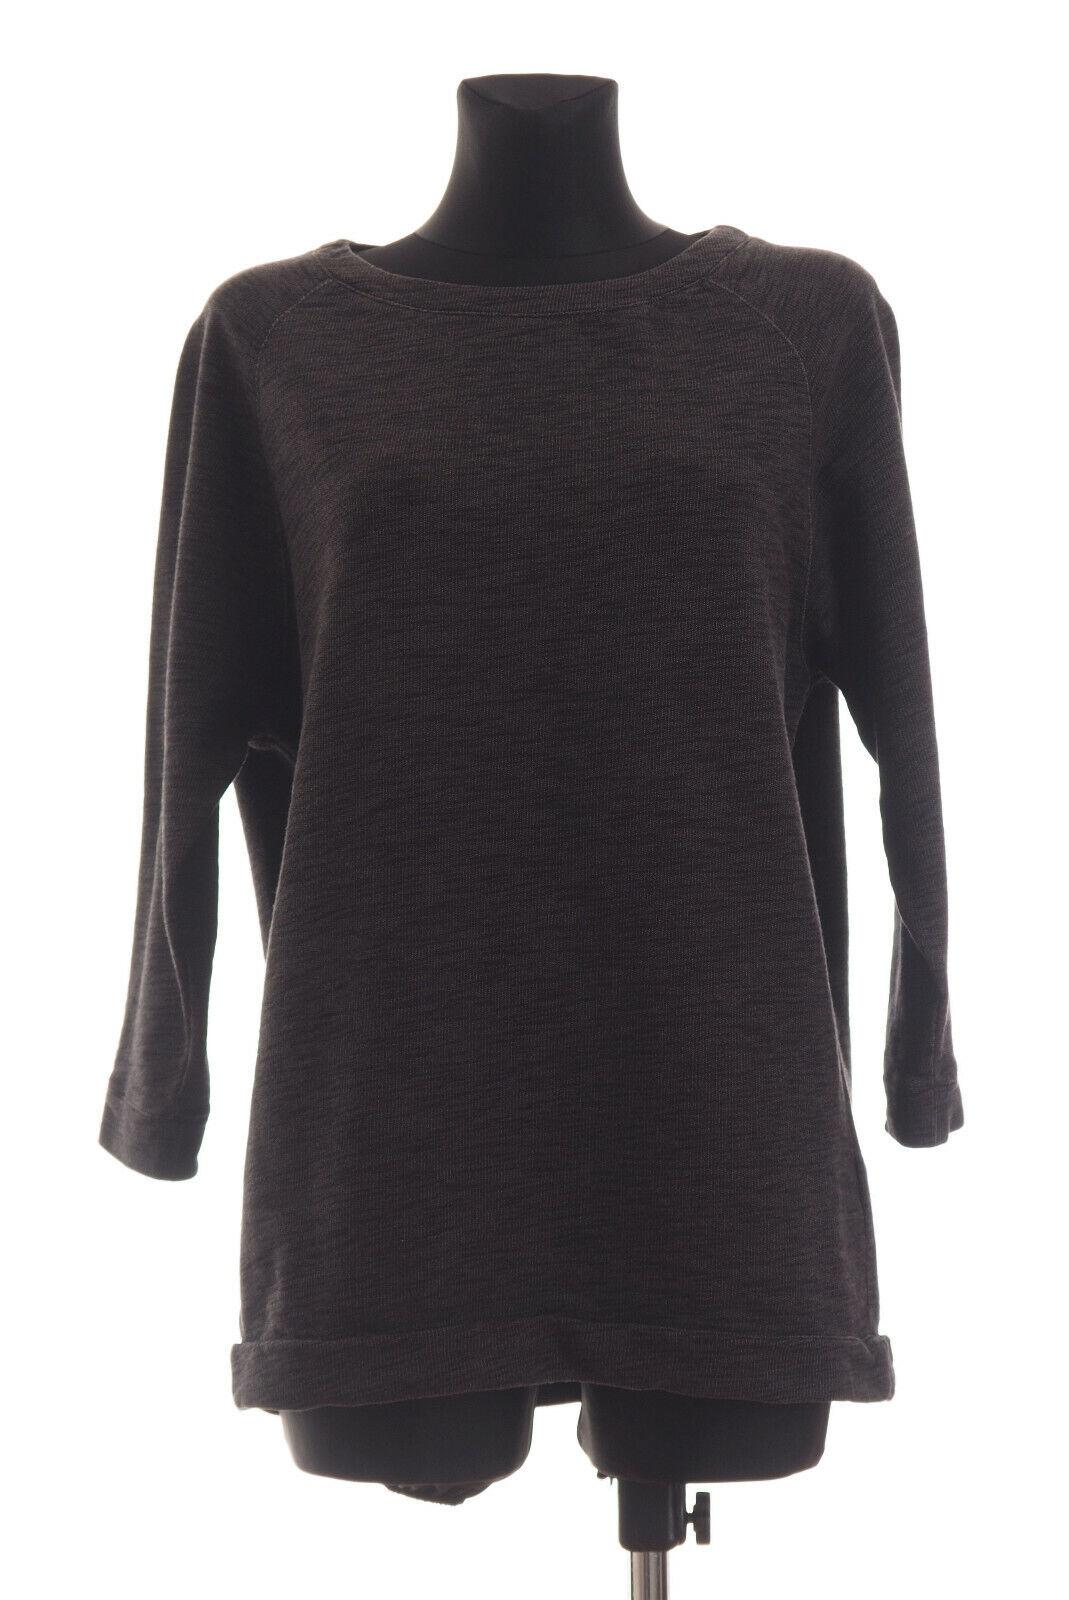 COS  Women's Grey Oversized Sweatshirt Size XS